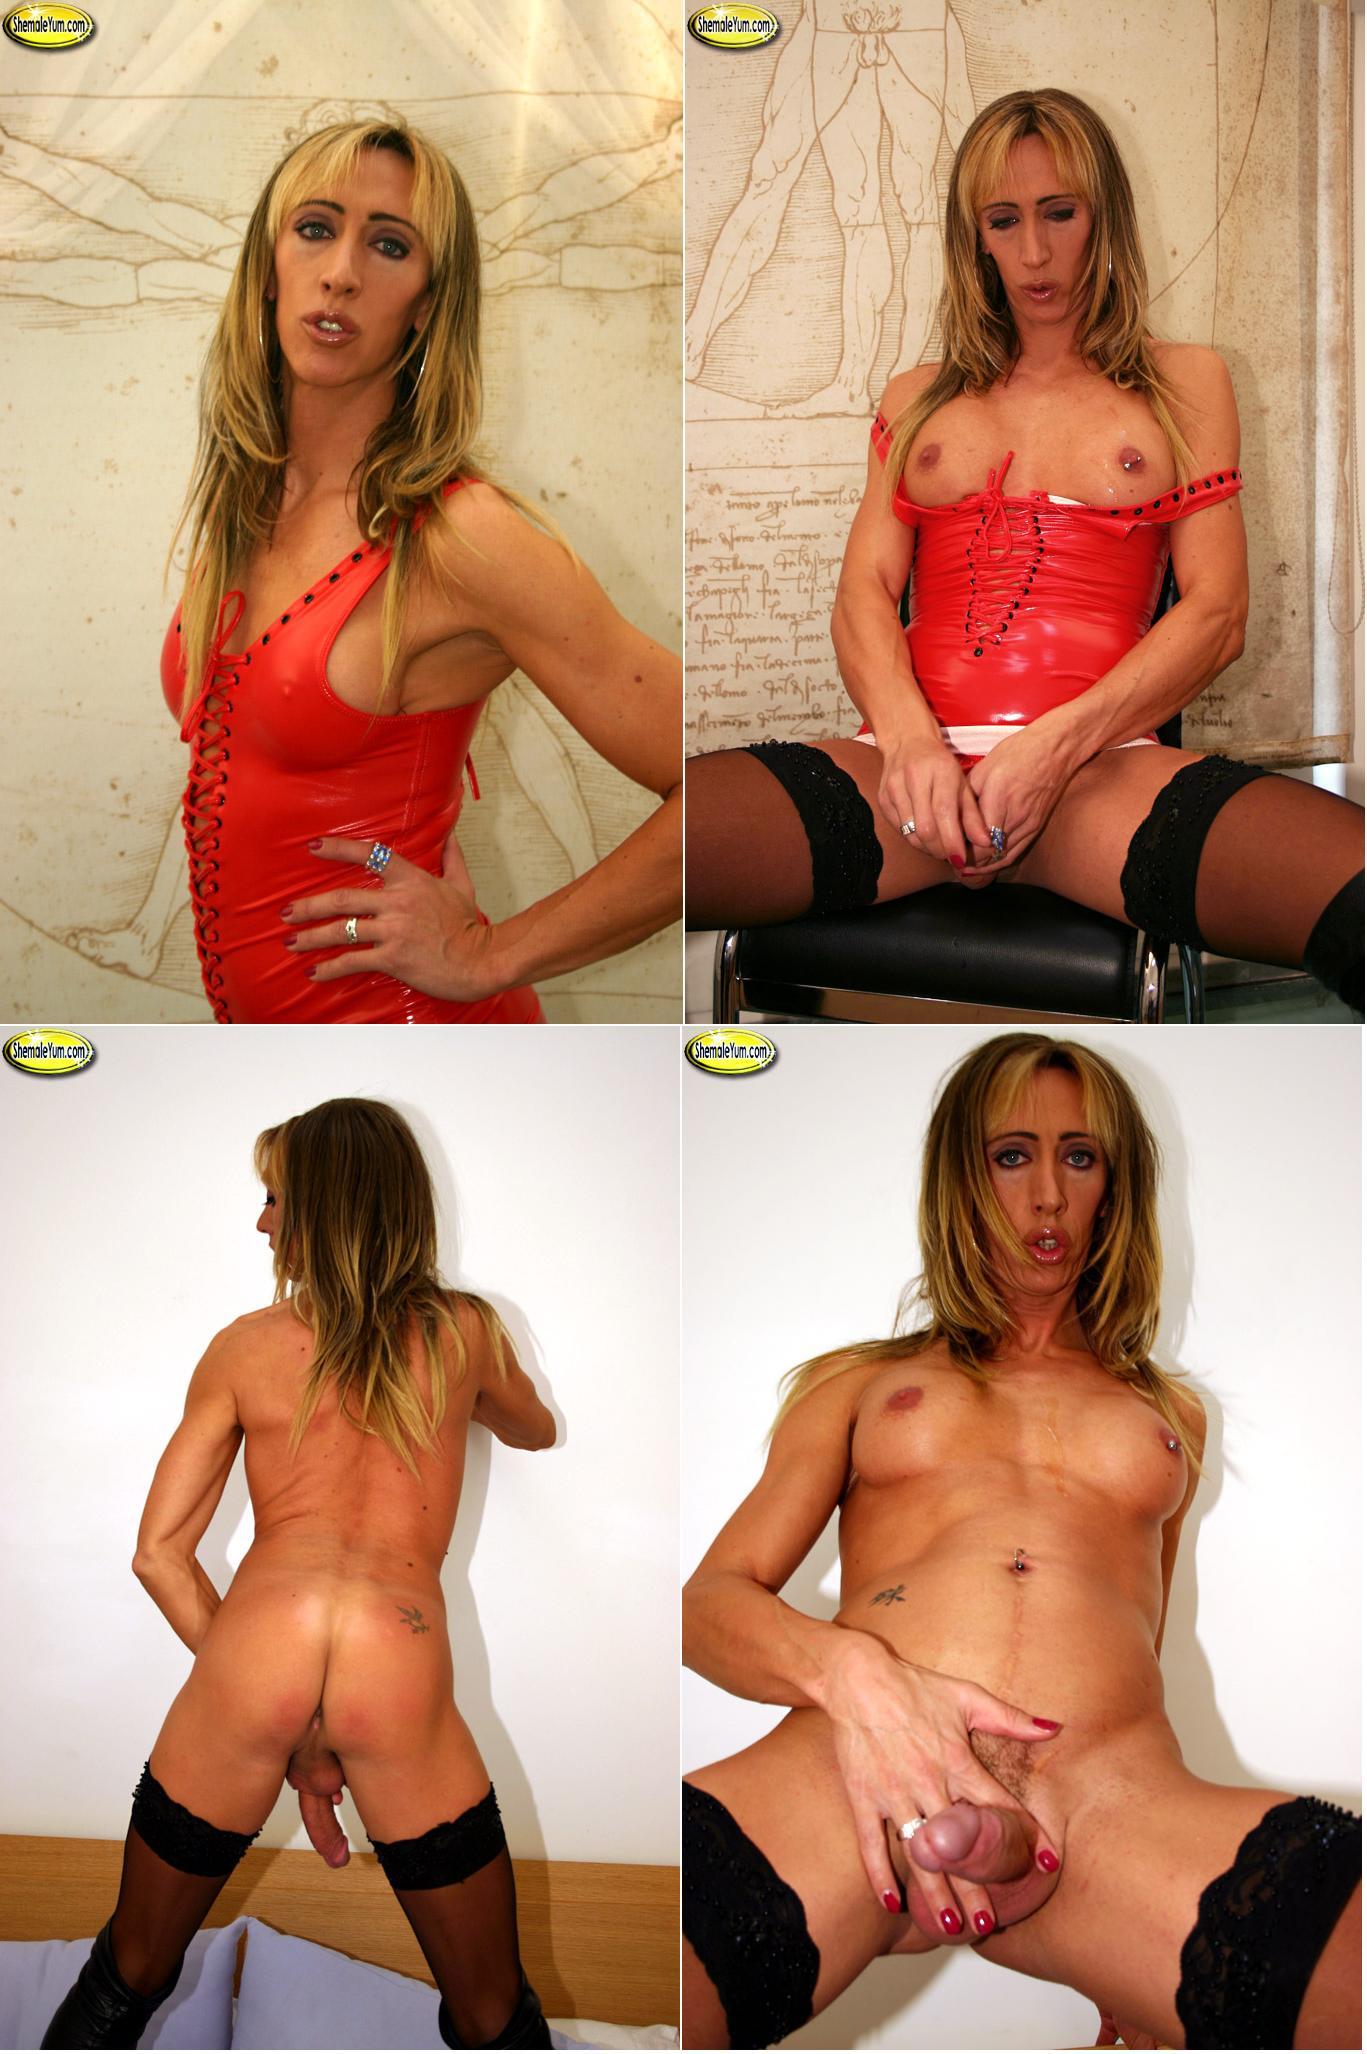 Shemale Yum - Pamela (blonde) - Pamela - Paris - Sammi - Viviana